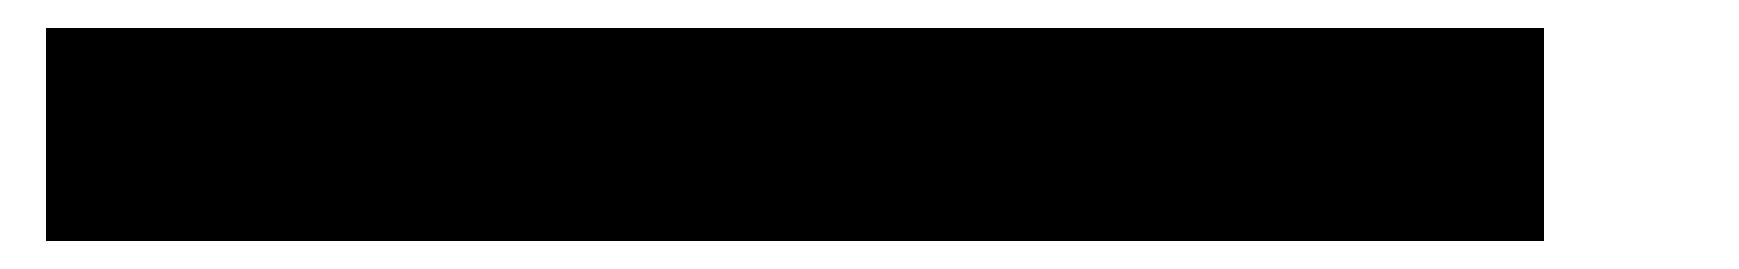 f:id:sky-pca:20191025182834p:plain